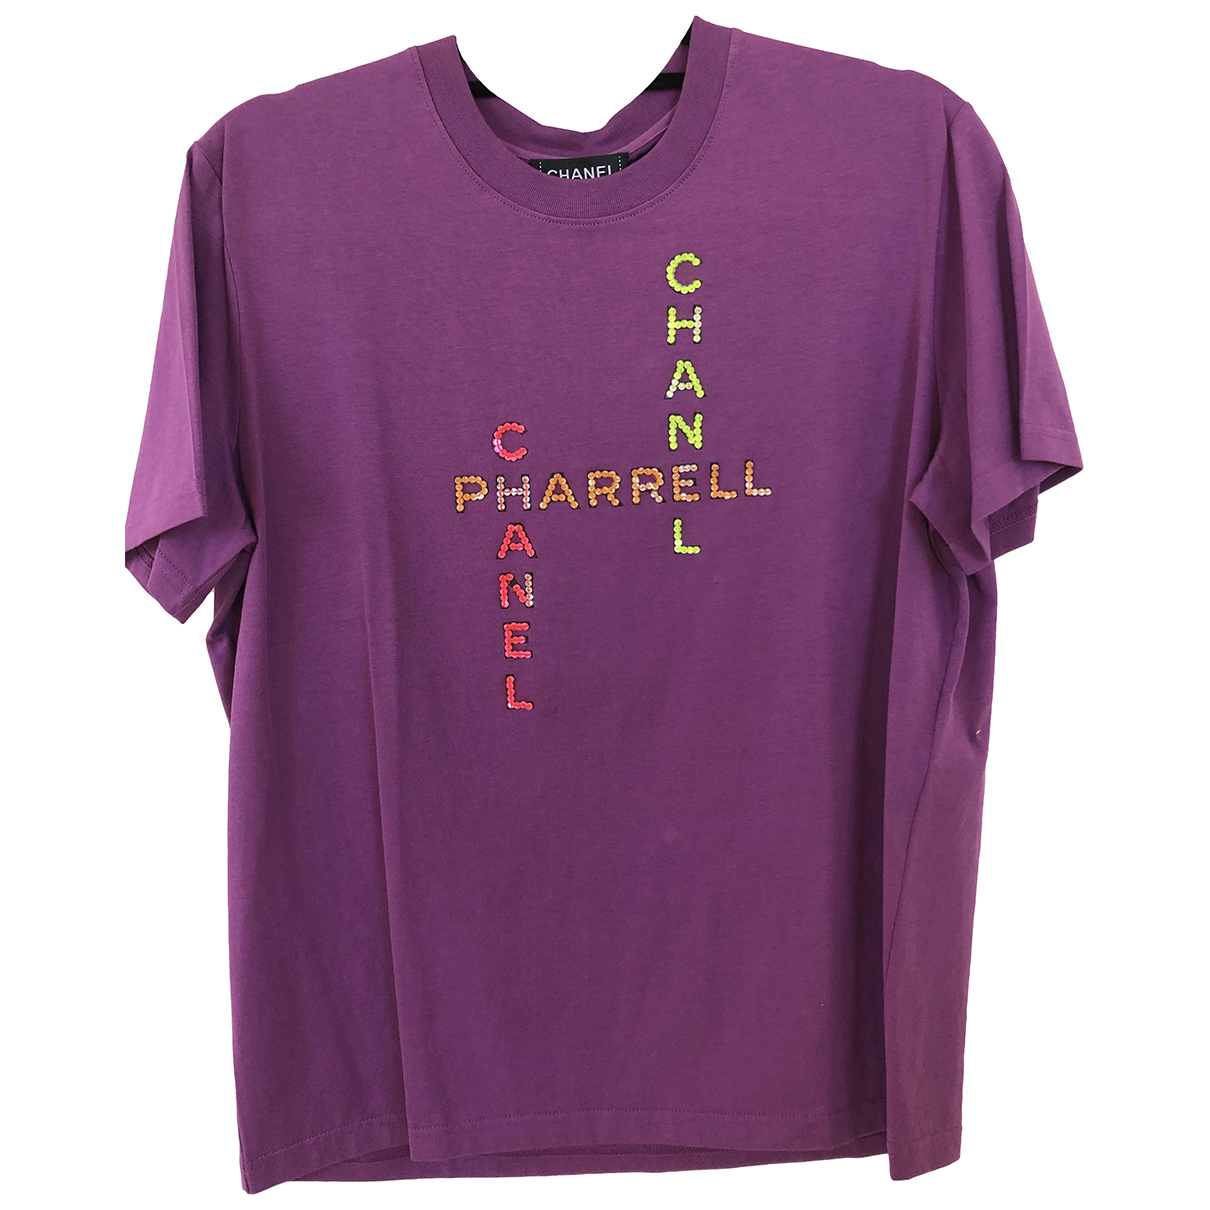 Chanel X Pharrell Williams - Tee shirts   pour homme en coton - violet